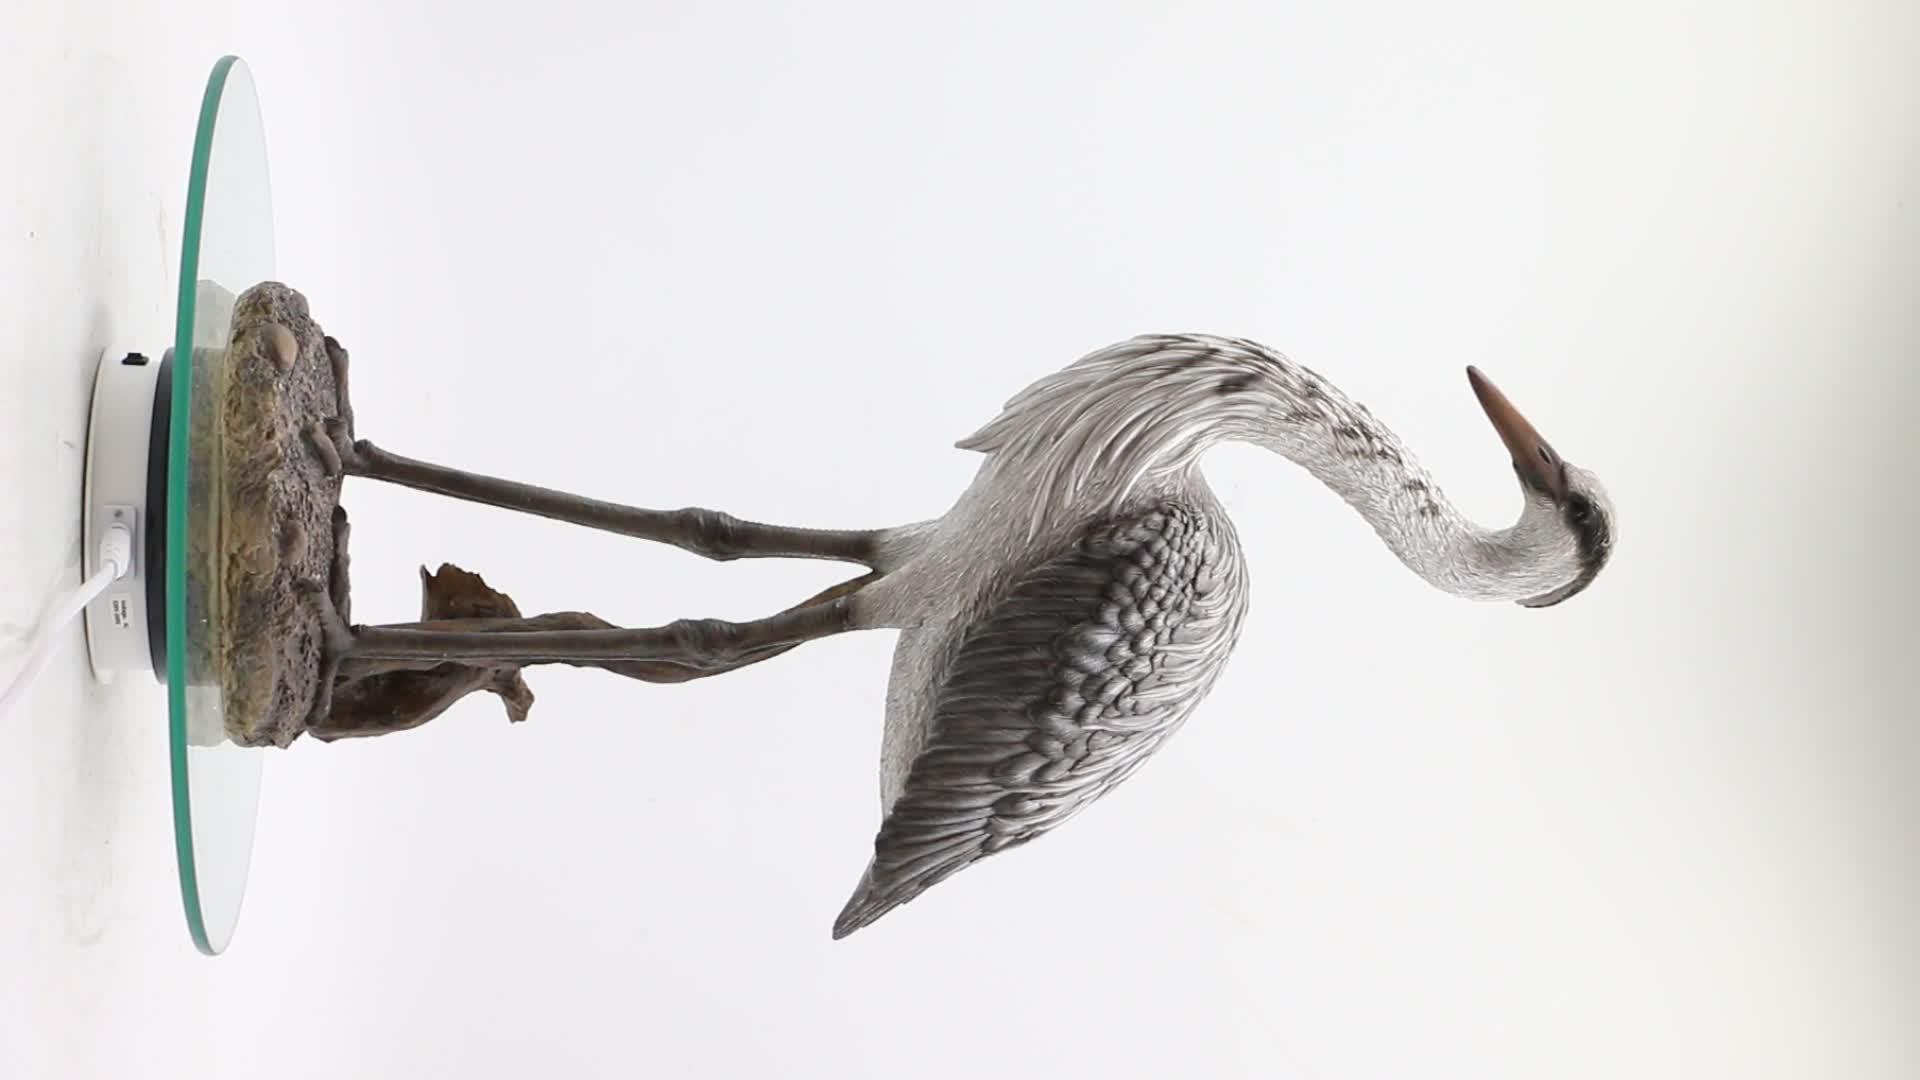 Garden animals resin bird ornaments egret statue, life size animal statues resin bird figurines&